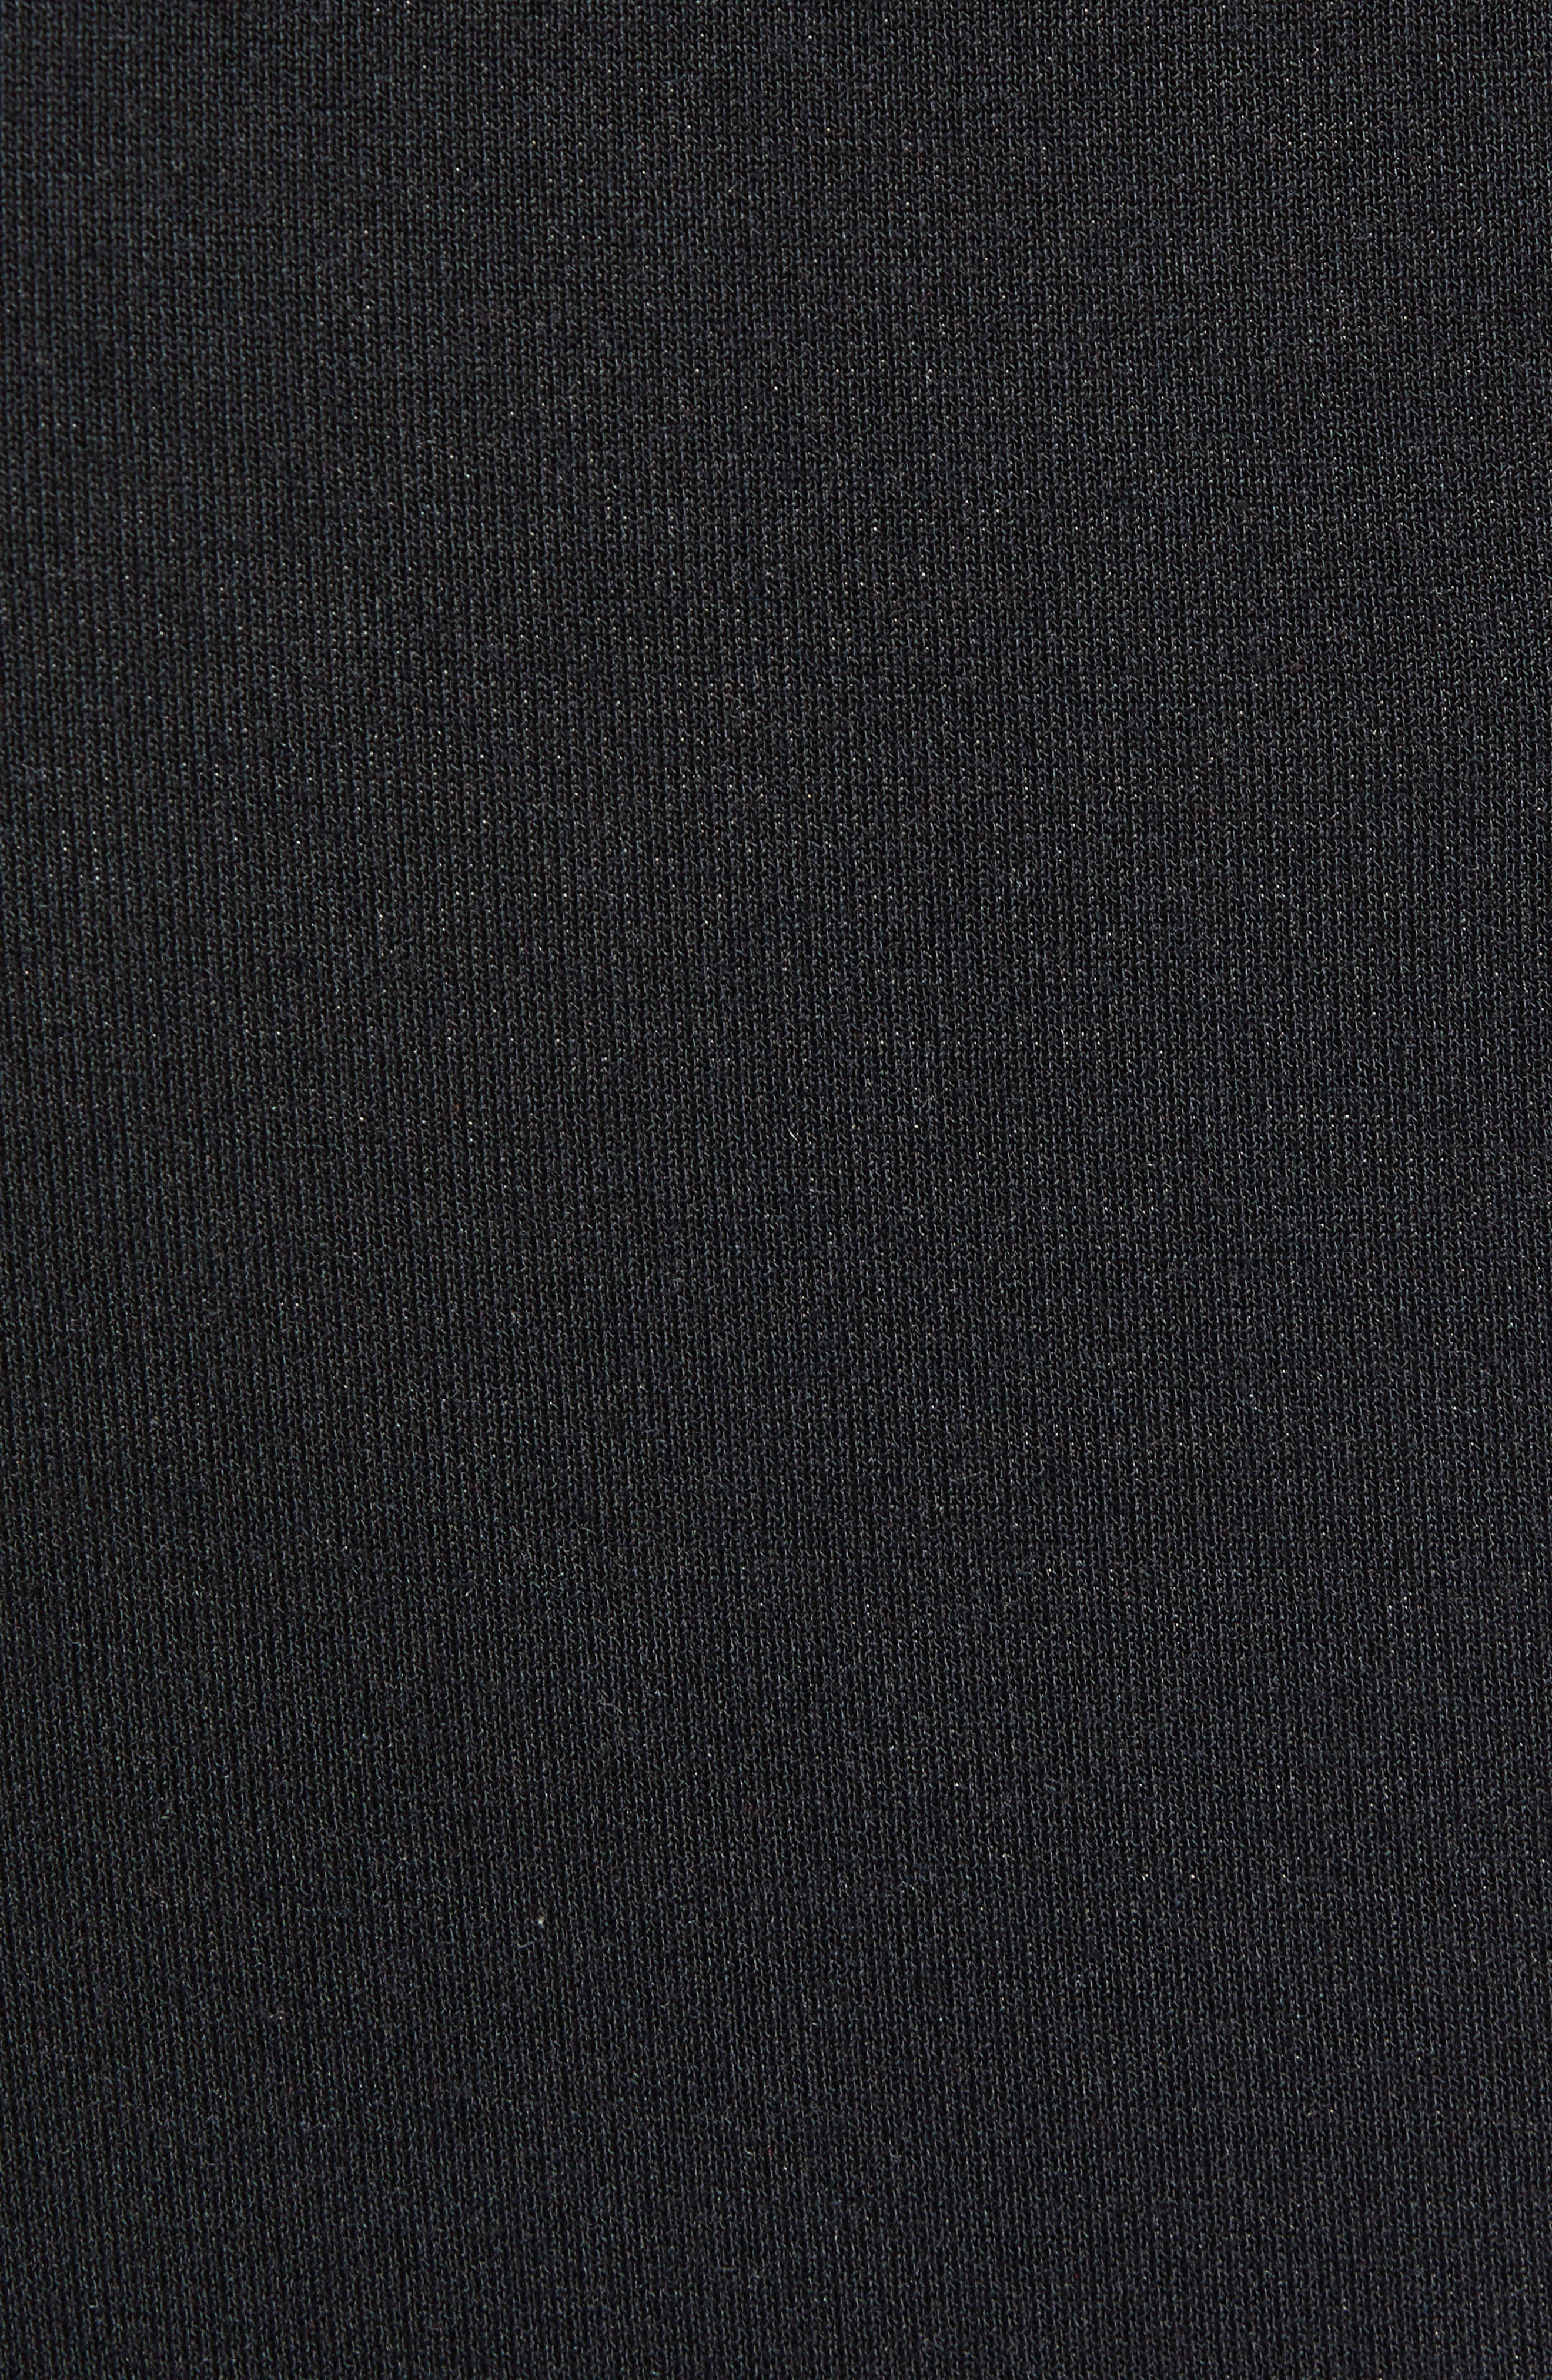 CALVIN KLEIN,                             Stretch Modal Lounge Pants,                             Alternate thumbnail 5, color,                             BLACK